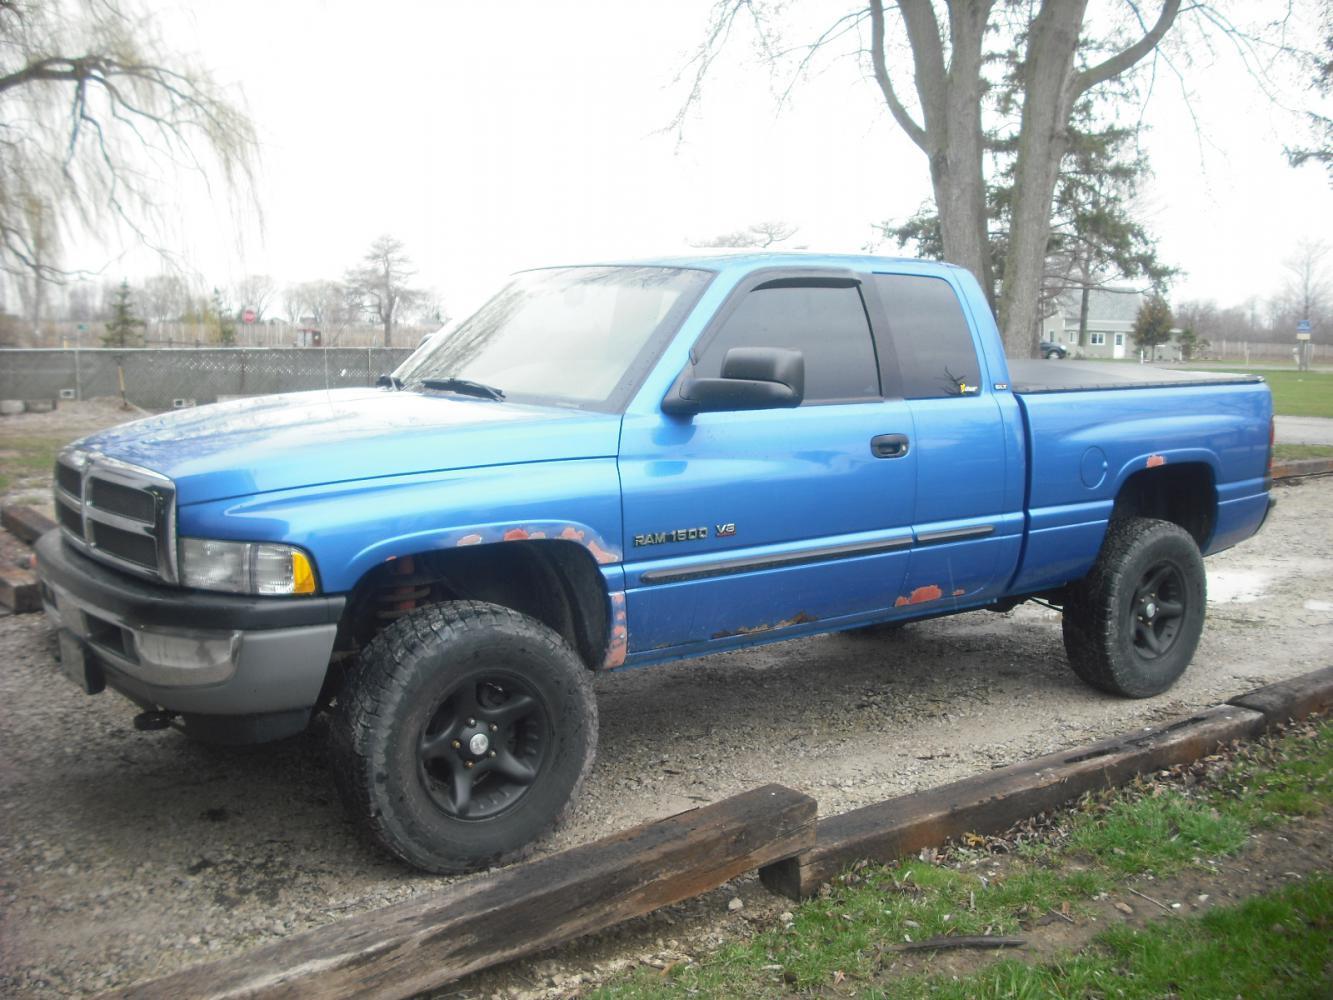 2001 dodge ram 1500 body work dodge dakota forum custom dakota truck forums. Black Bedroom Furniture Sets. Home Design Ideas